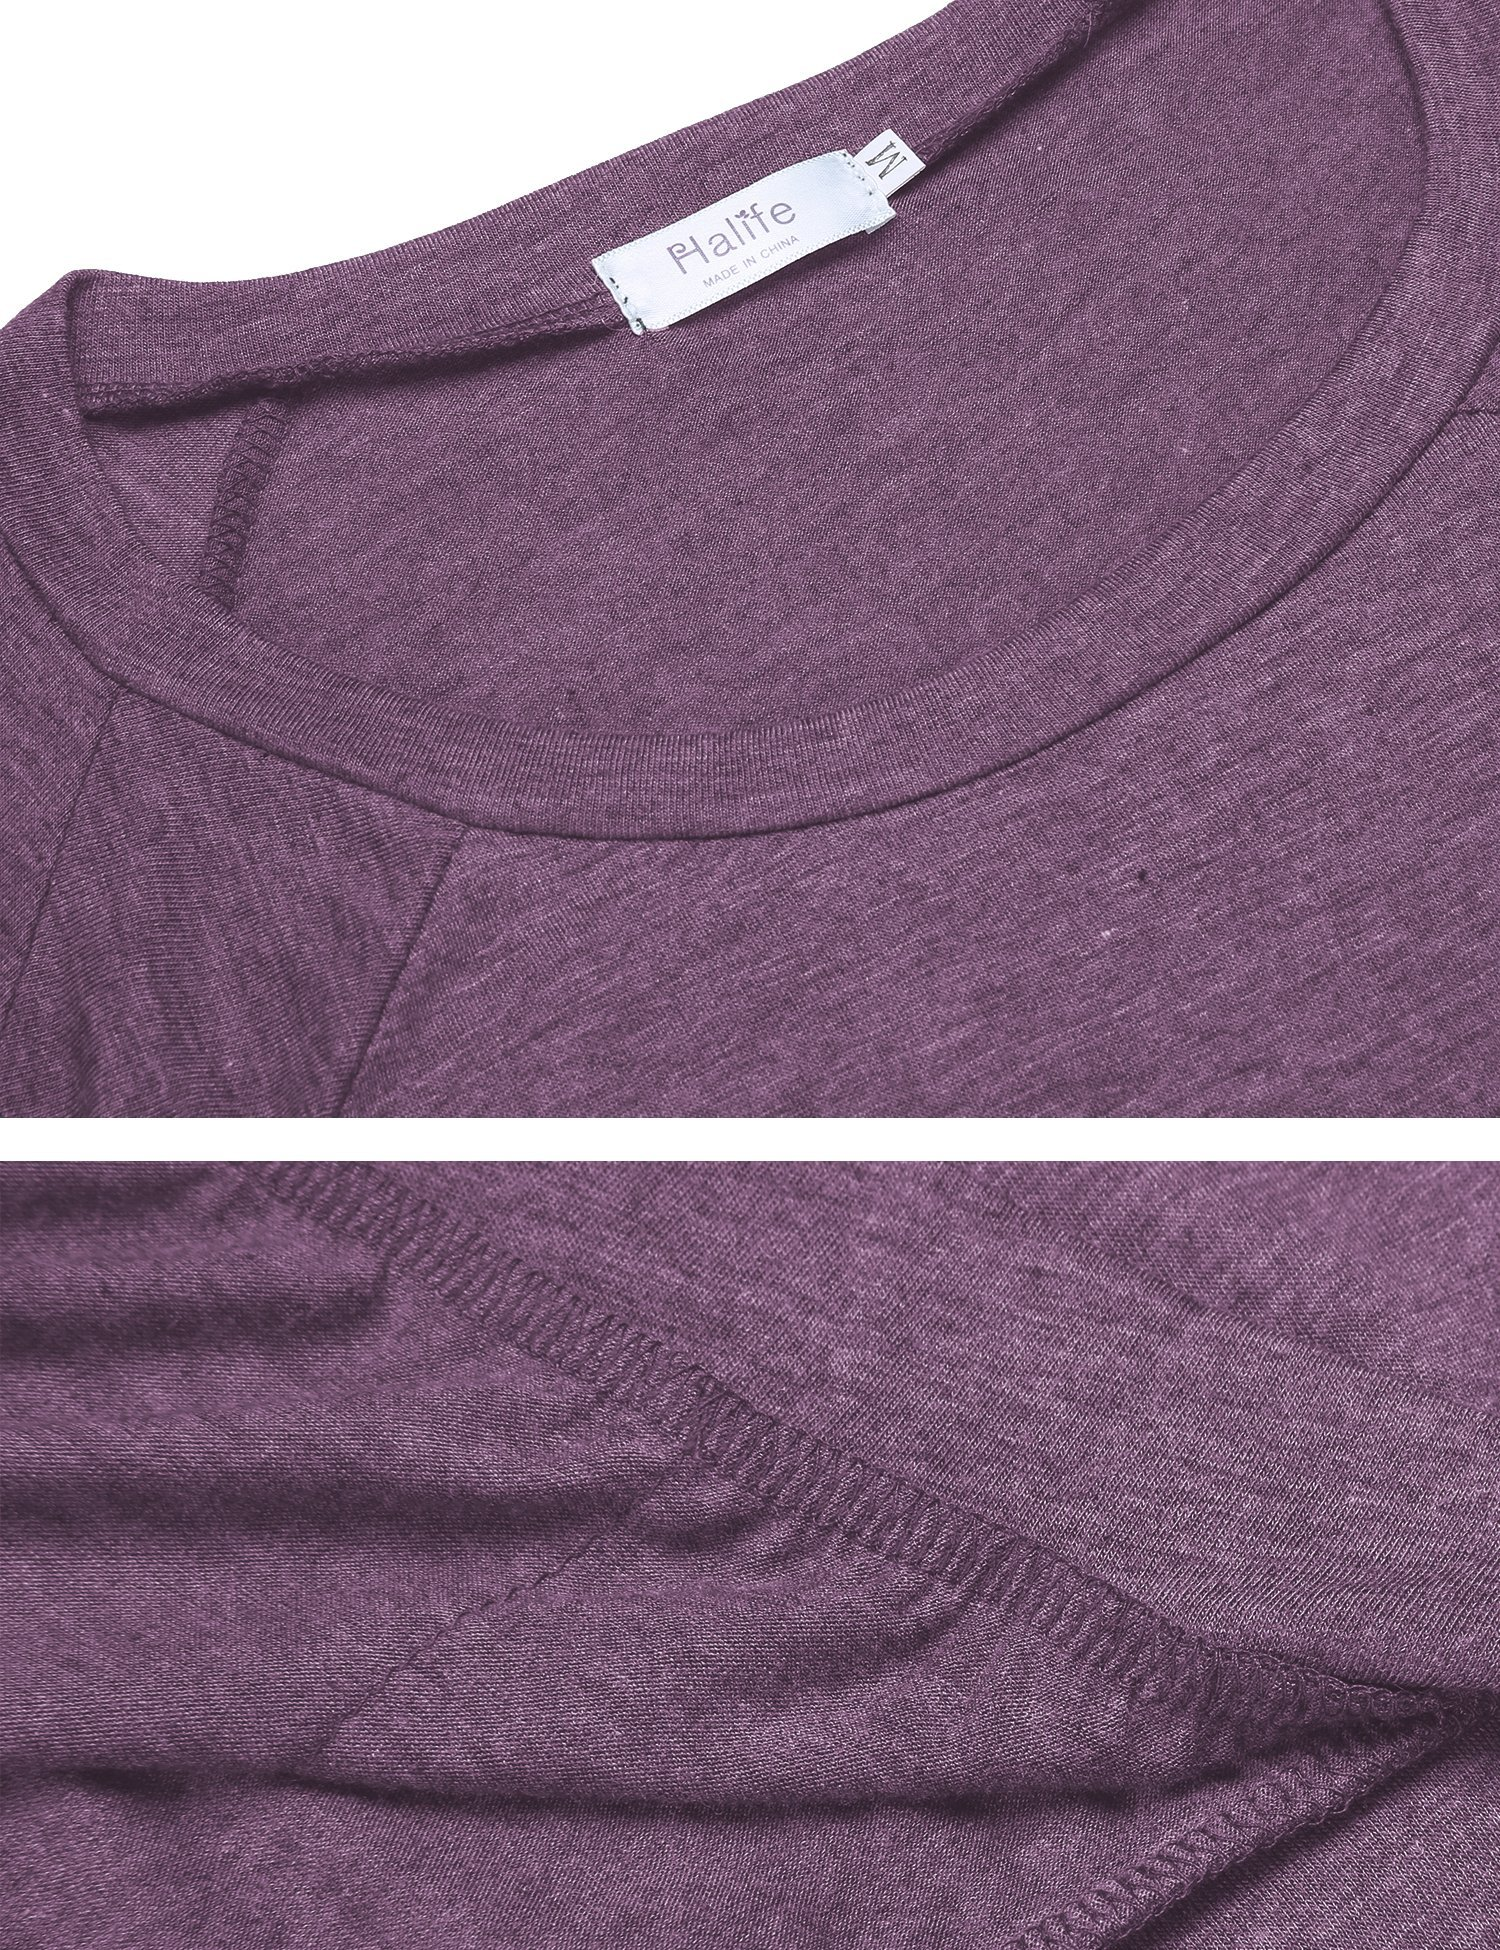 Halife Loose Tunic Shirt Short Sleeve, Womens Casual Pockets T Shirt Tops Purple XL by Halife (Image #7)